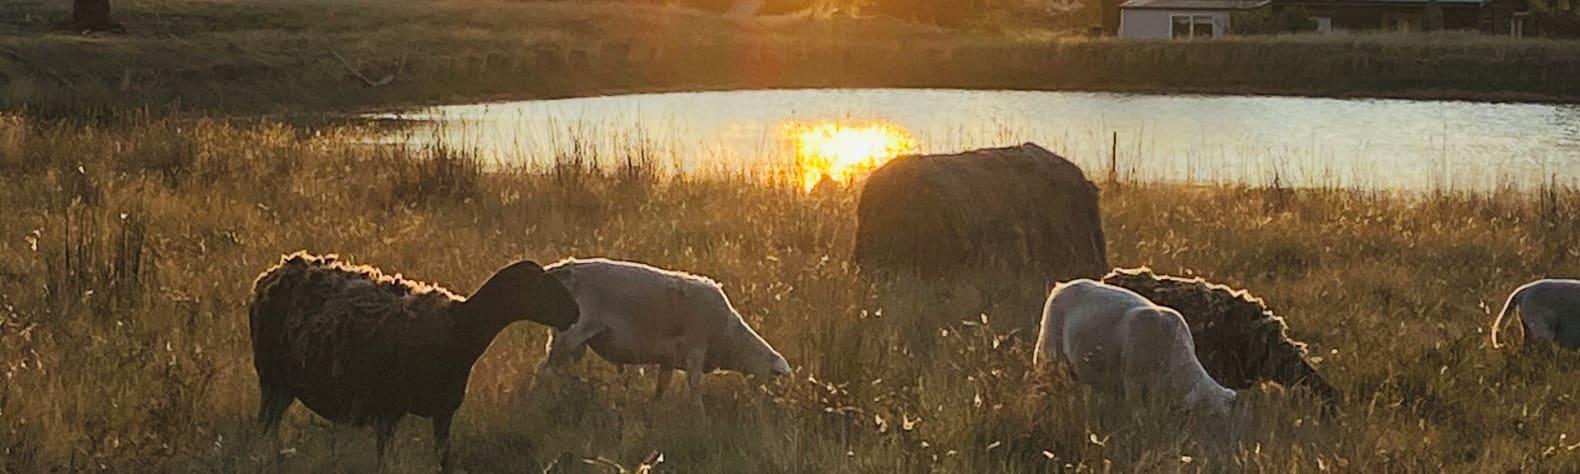 Mornington Country Getaway.